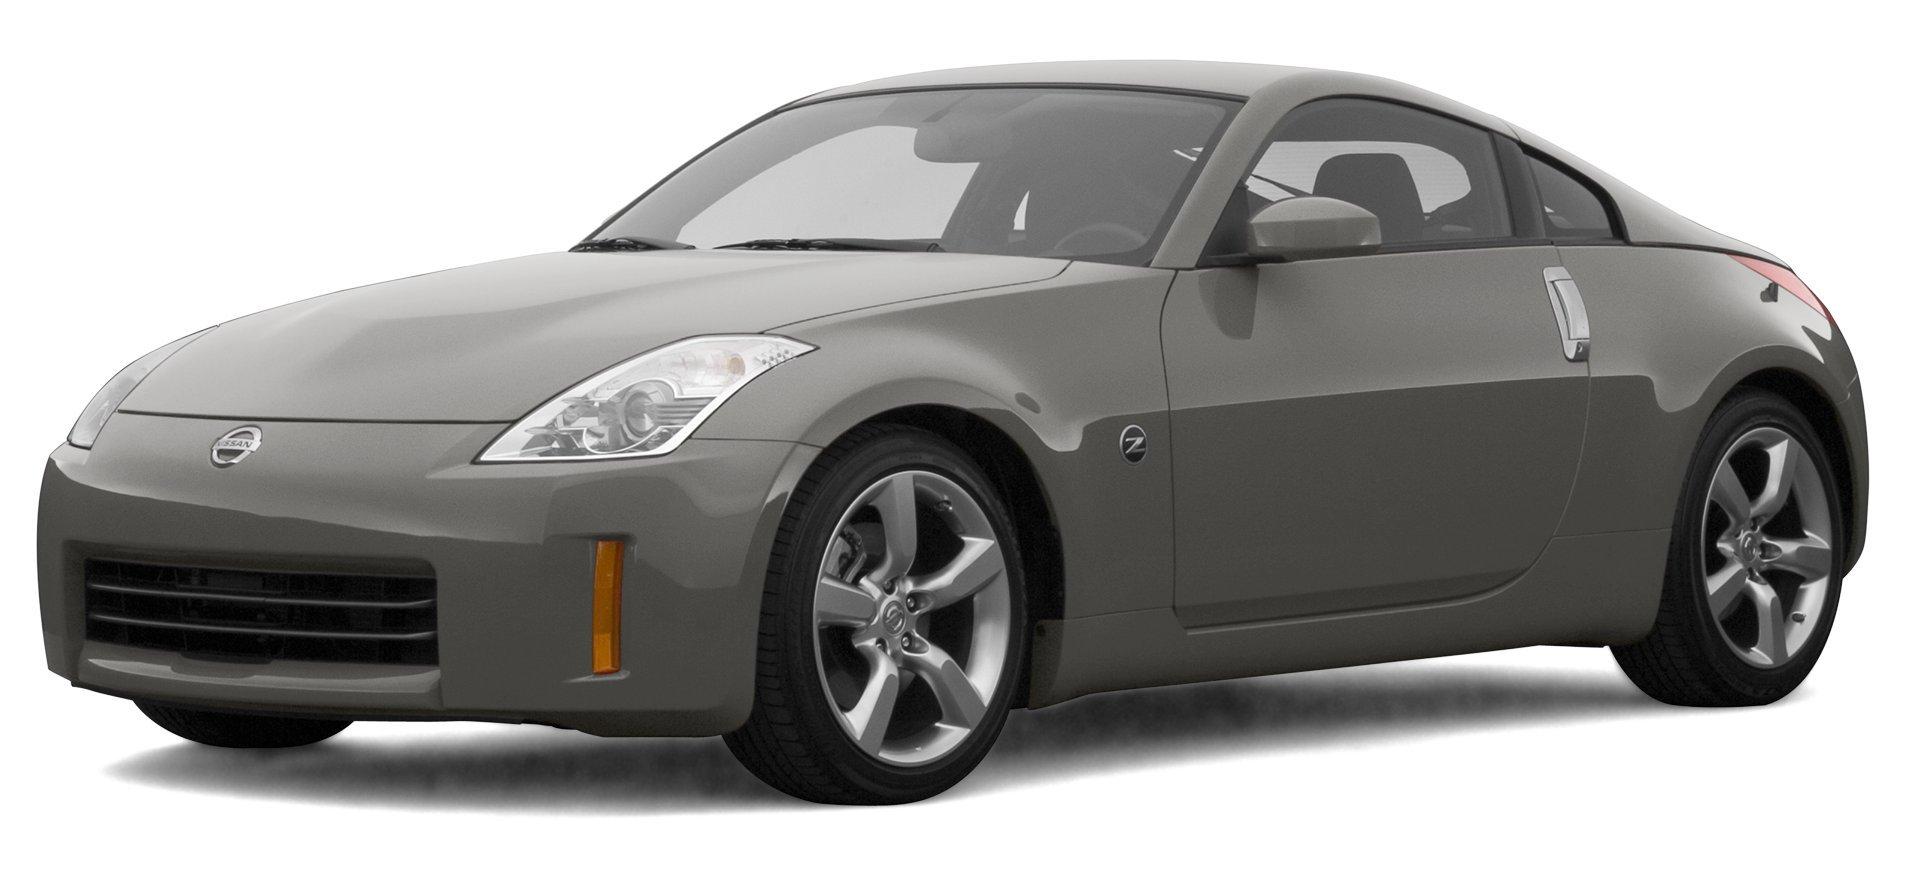 Amazon Com 2007 Nissan 350z Reviews Images And Specs Vehicles